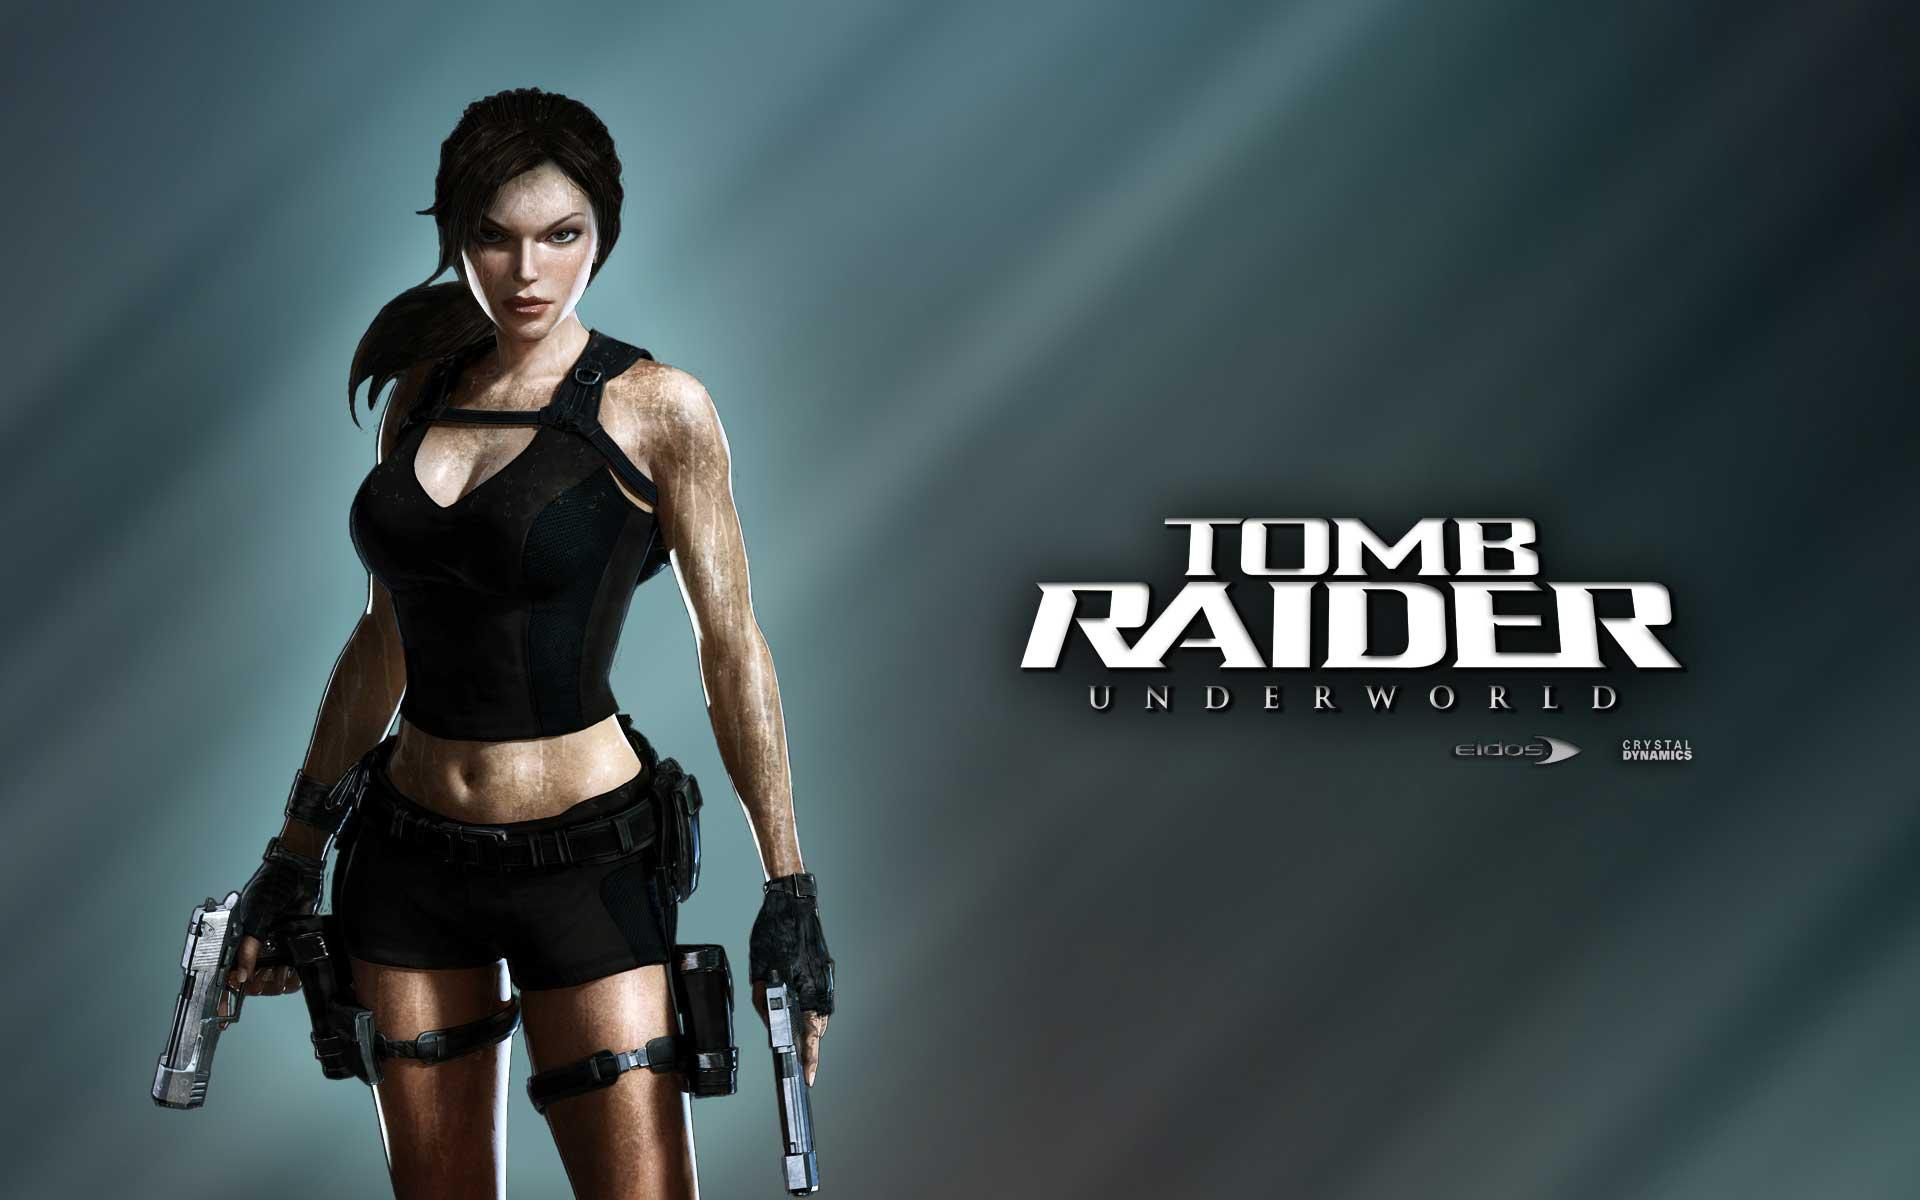 Tomb Raider Underworld Wallpapers ImageBankbiz 1920x1200